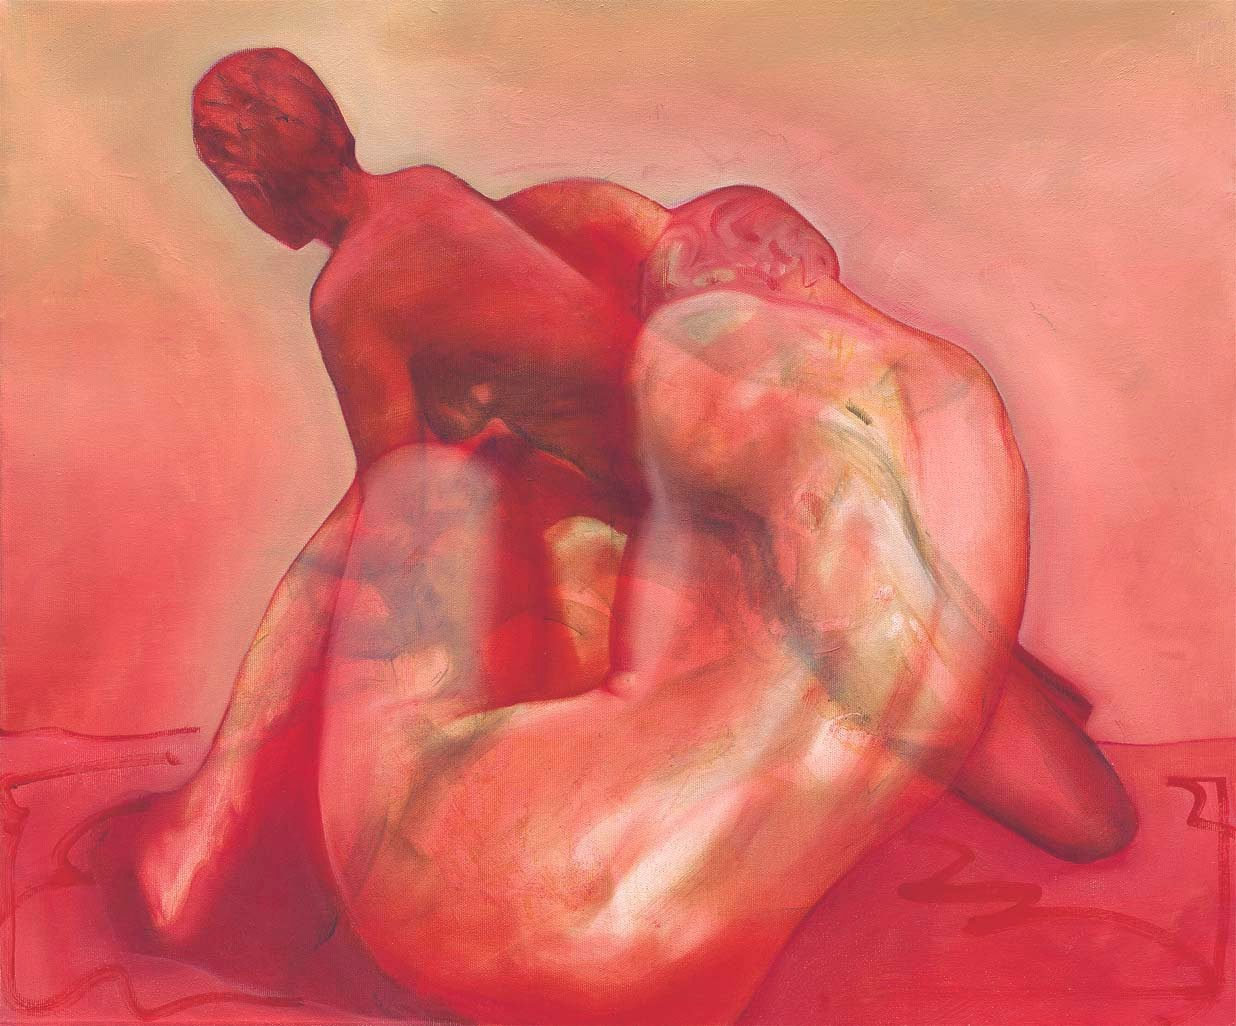 Inside the Story Oil , 2005, 55 x 66 cm, oil on canvas